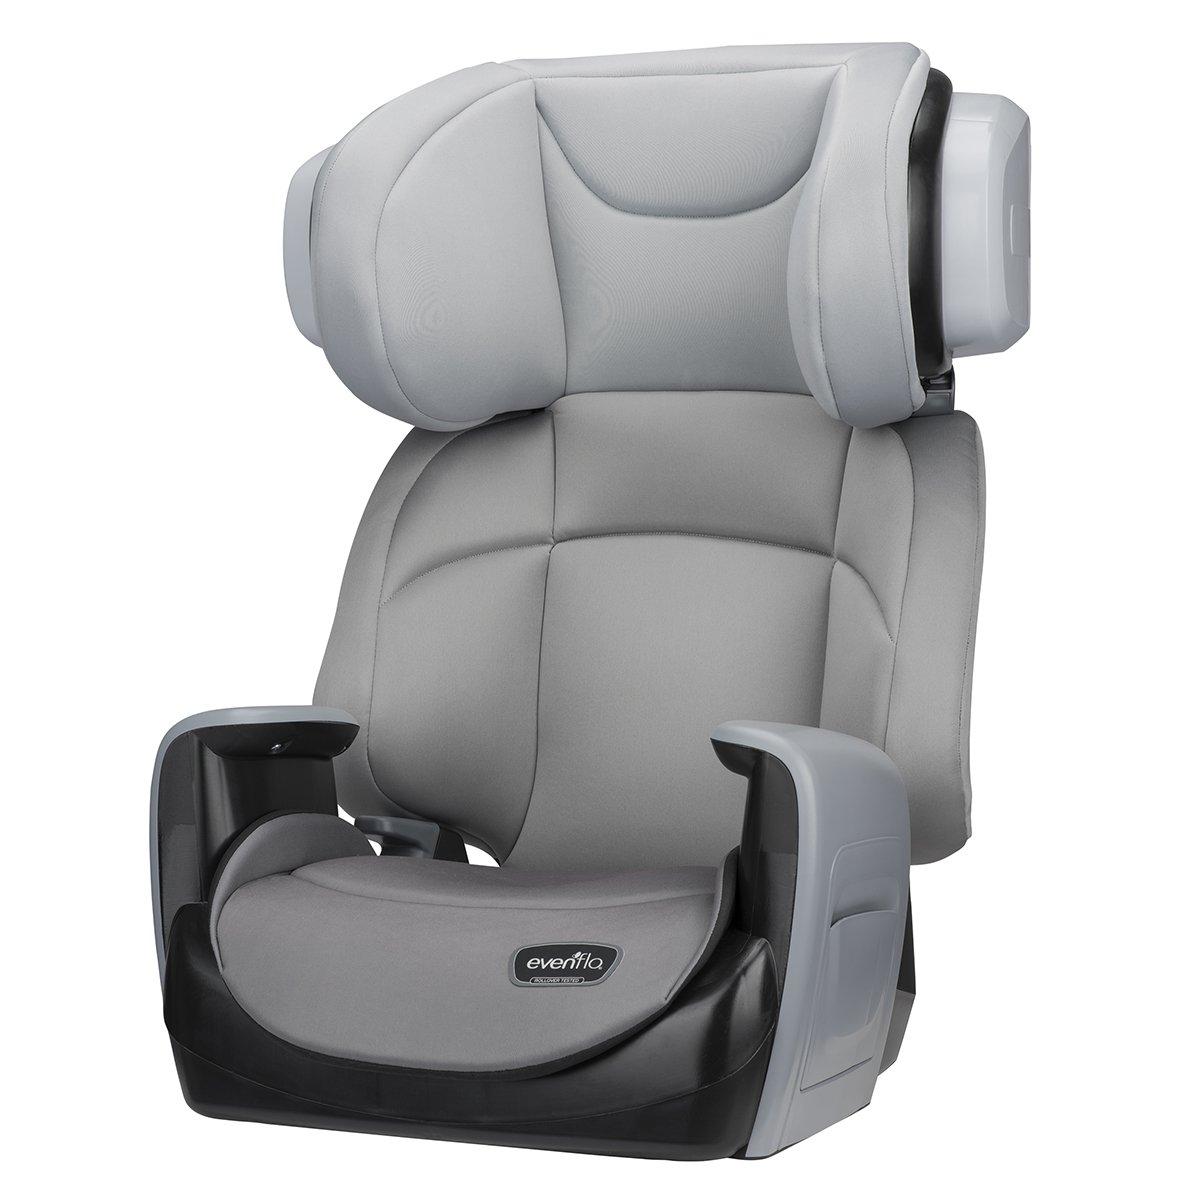 Evenflo Spectrum 2 In 1 Booster Car Seat Varsity Blue 34212025